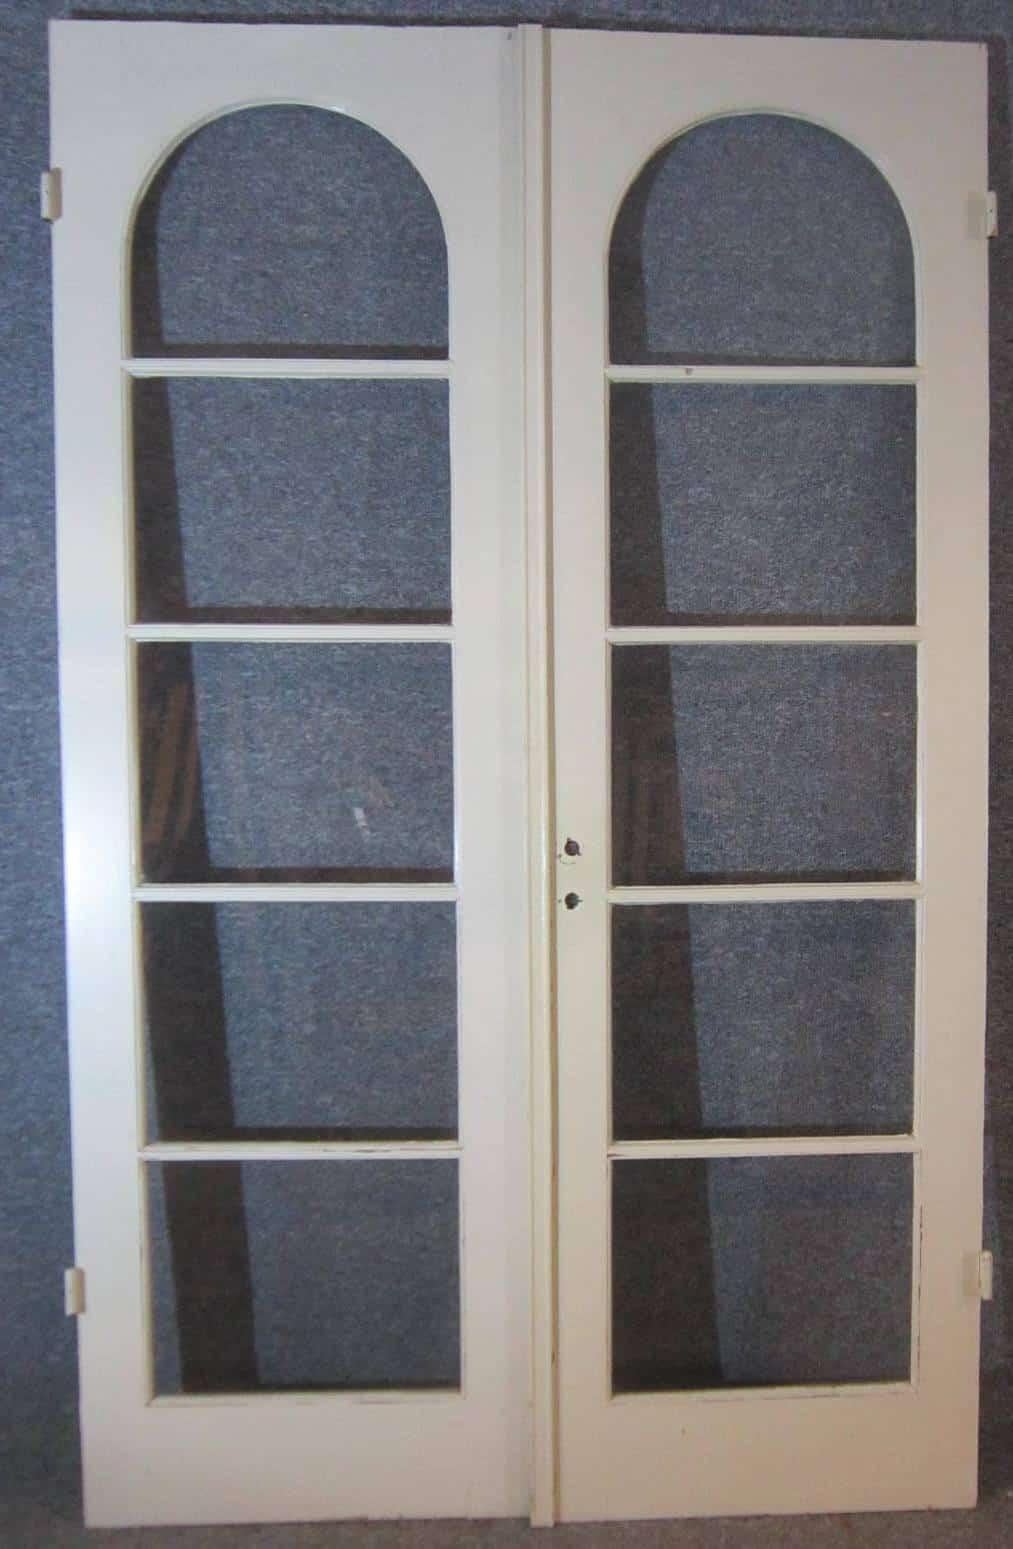 doppelflügelige Zimmertür